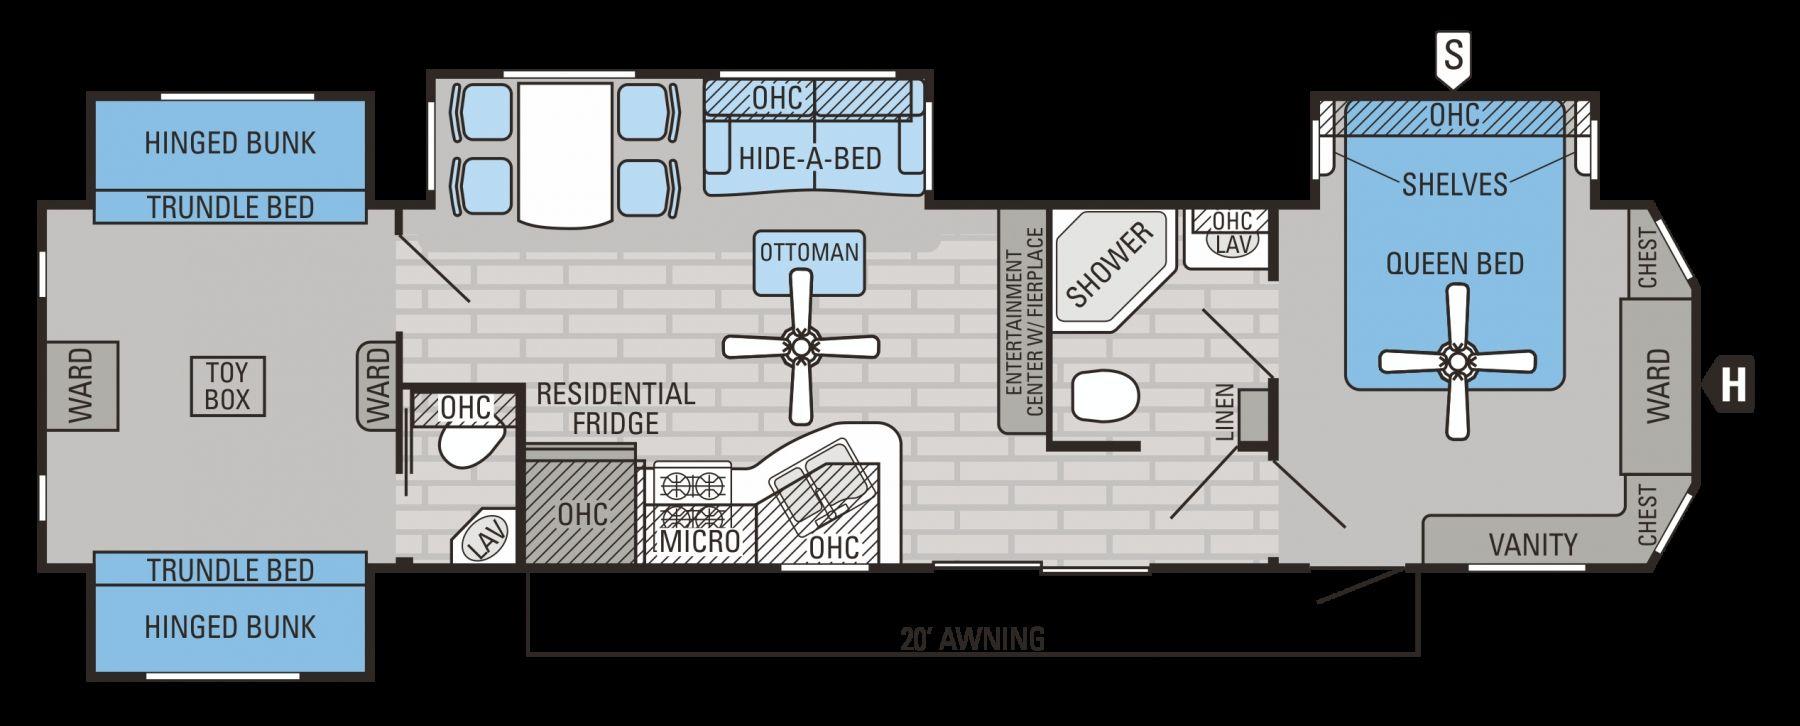 Coleman Travel Trailers Floor Plans >> 30 Amazing Image of Unique Travel Trailer Floor Plans ...